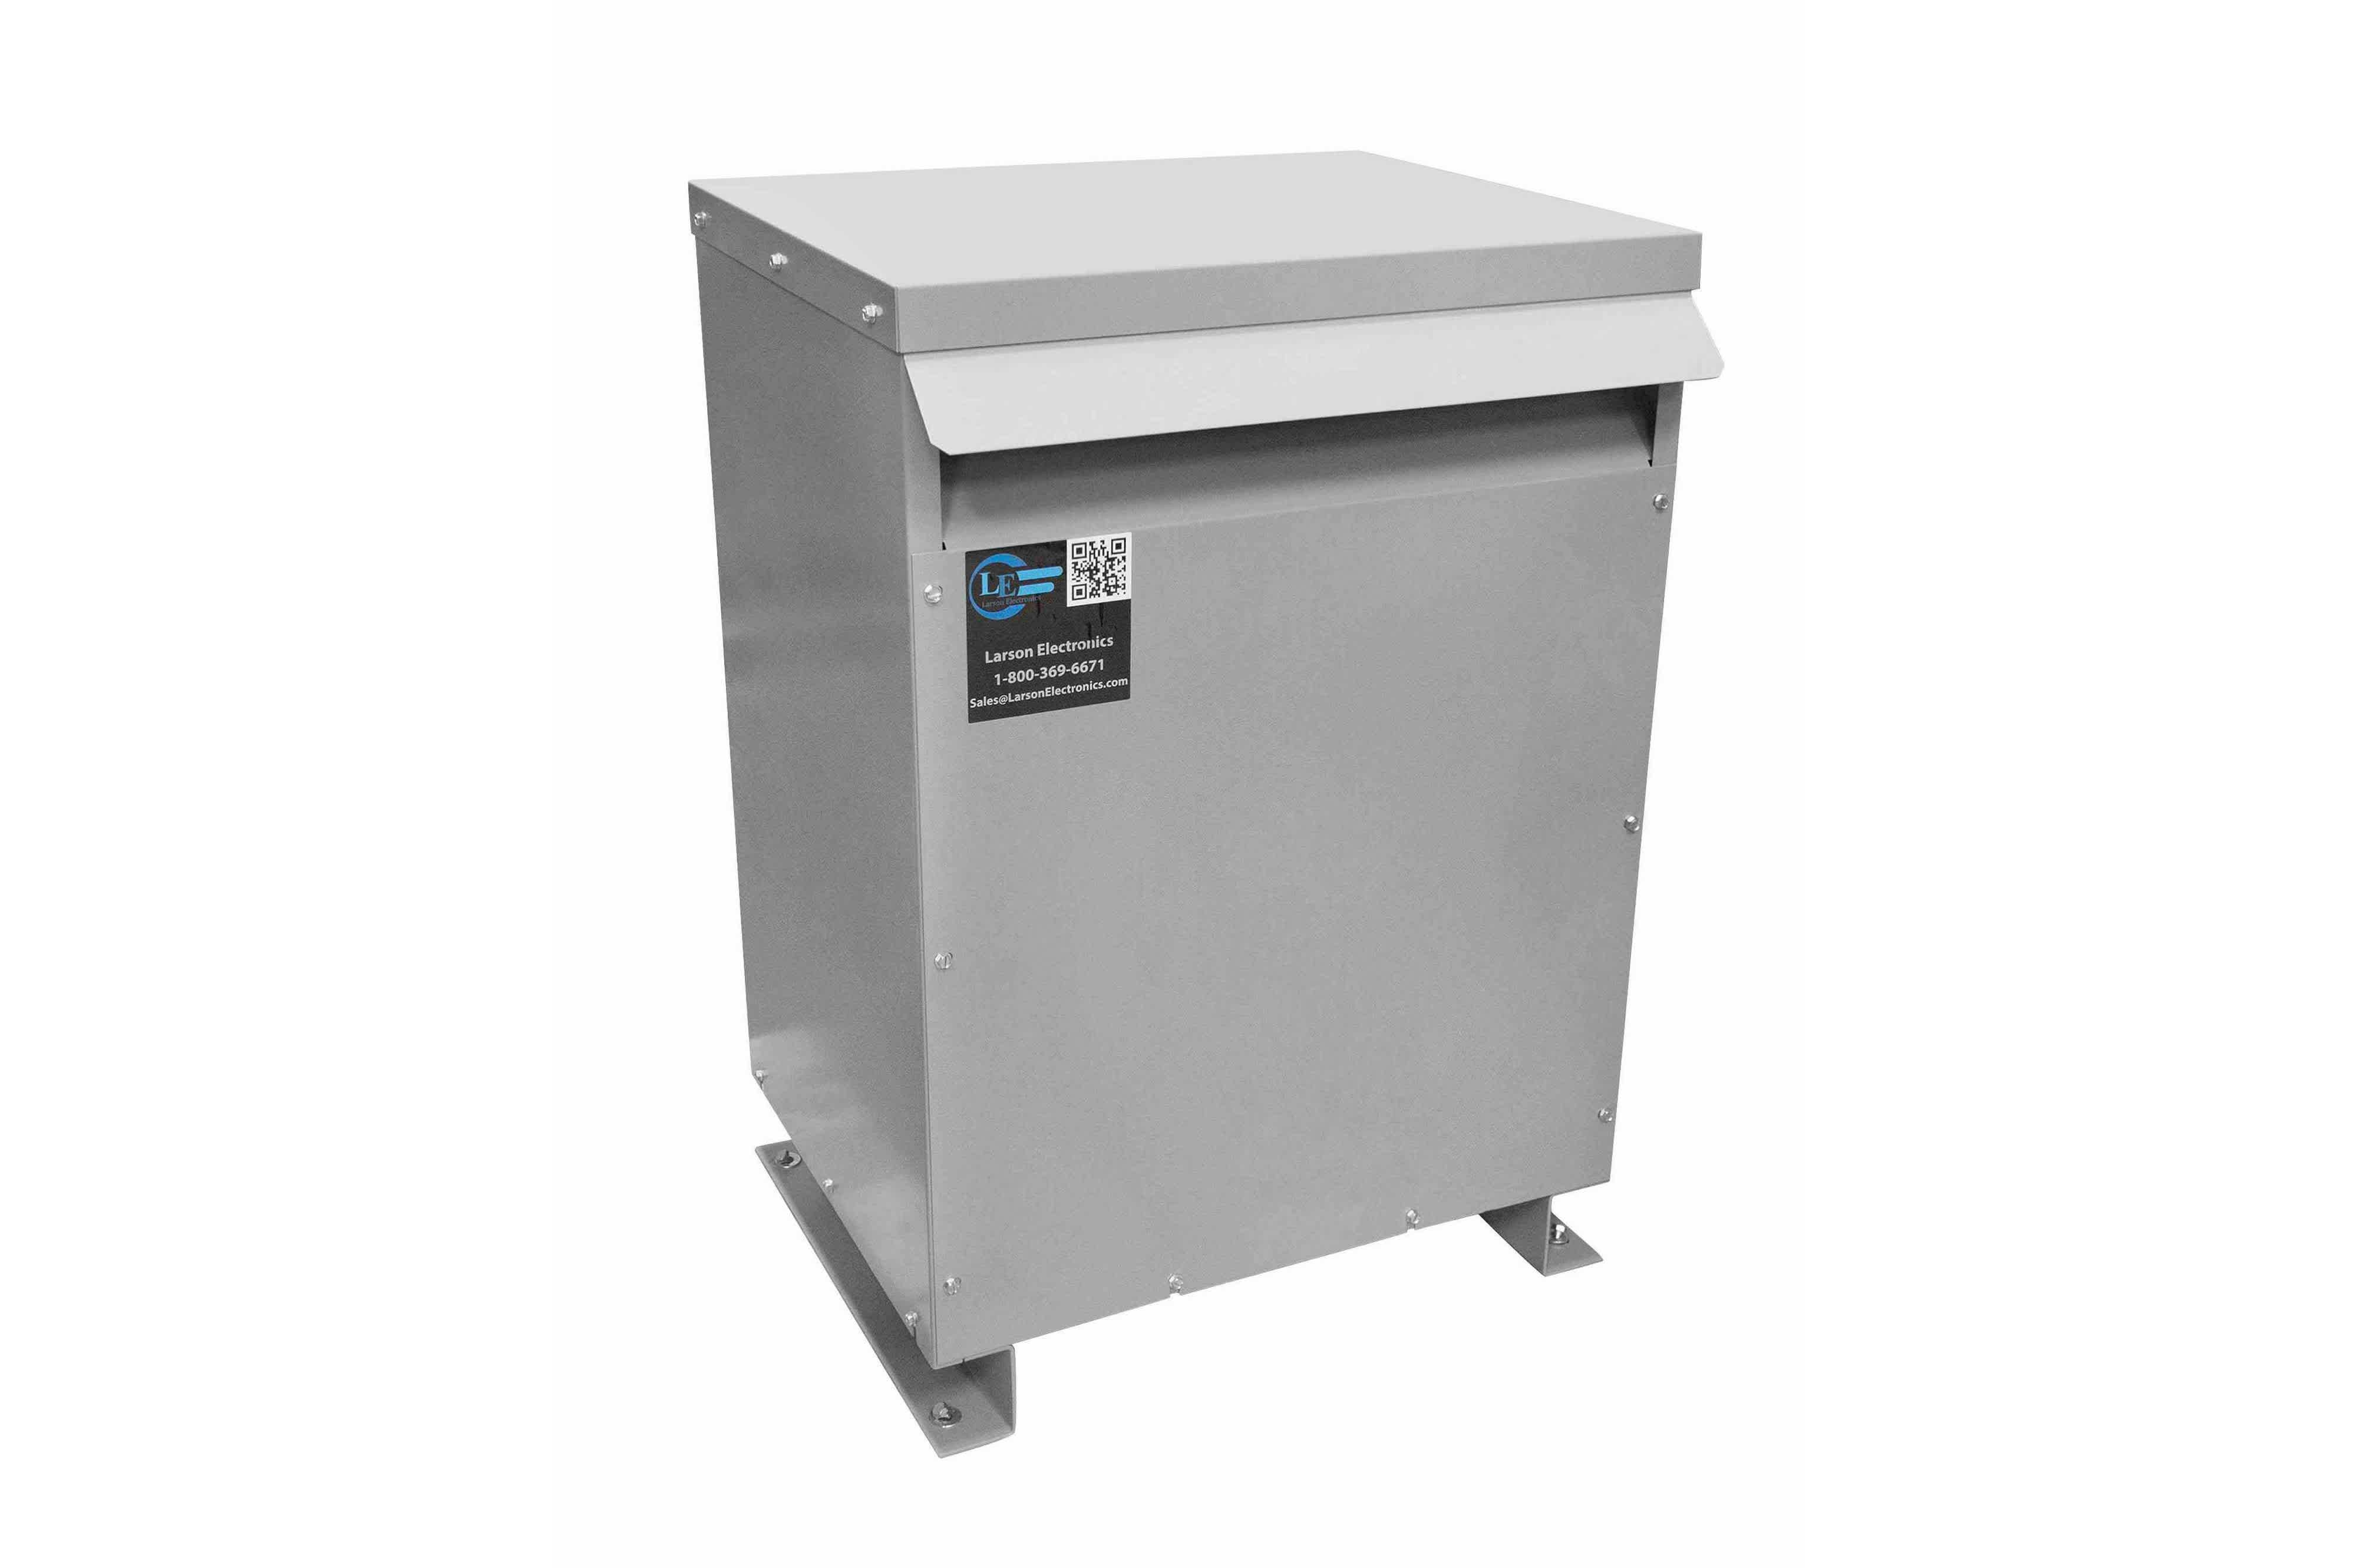 27 kVA 3PH Isolation Transformer, 220V Wye Primary, 208V Delta Secondary, N3R, Ventilated, 60 Hz